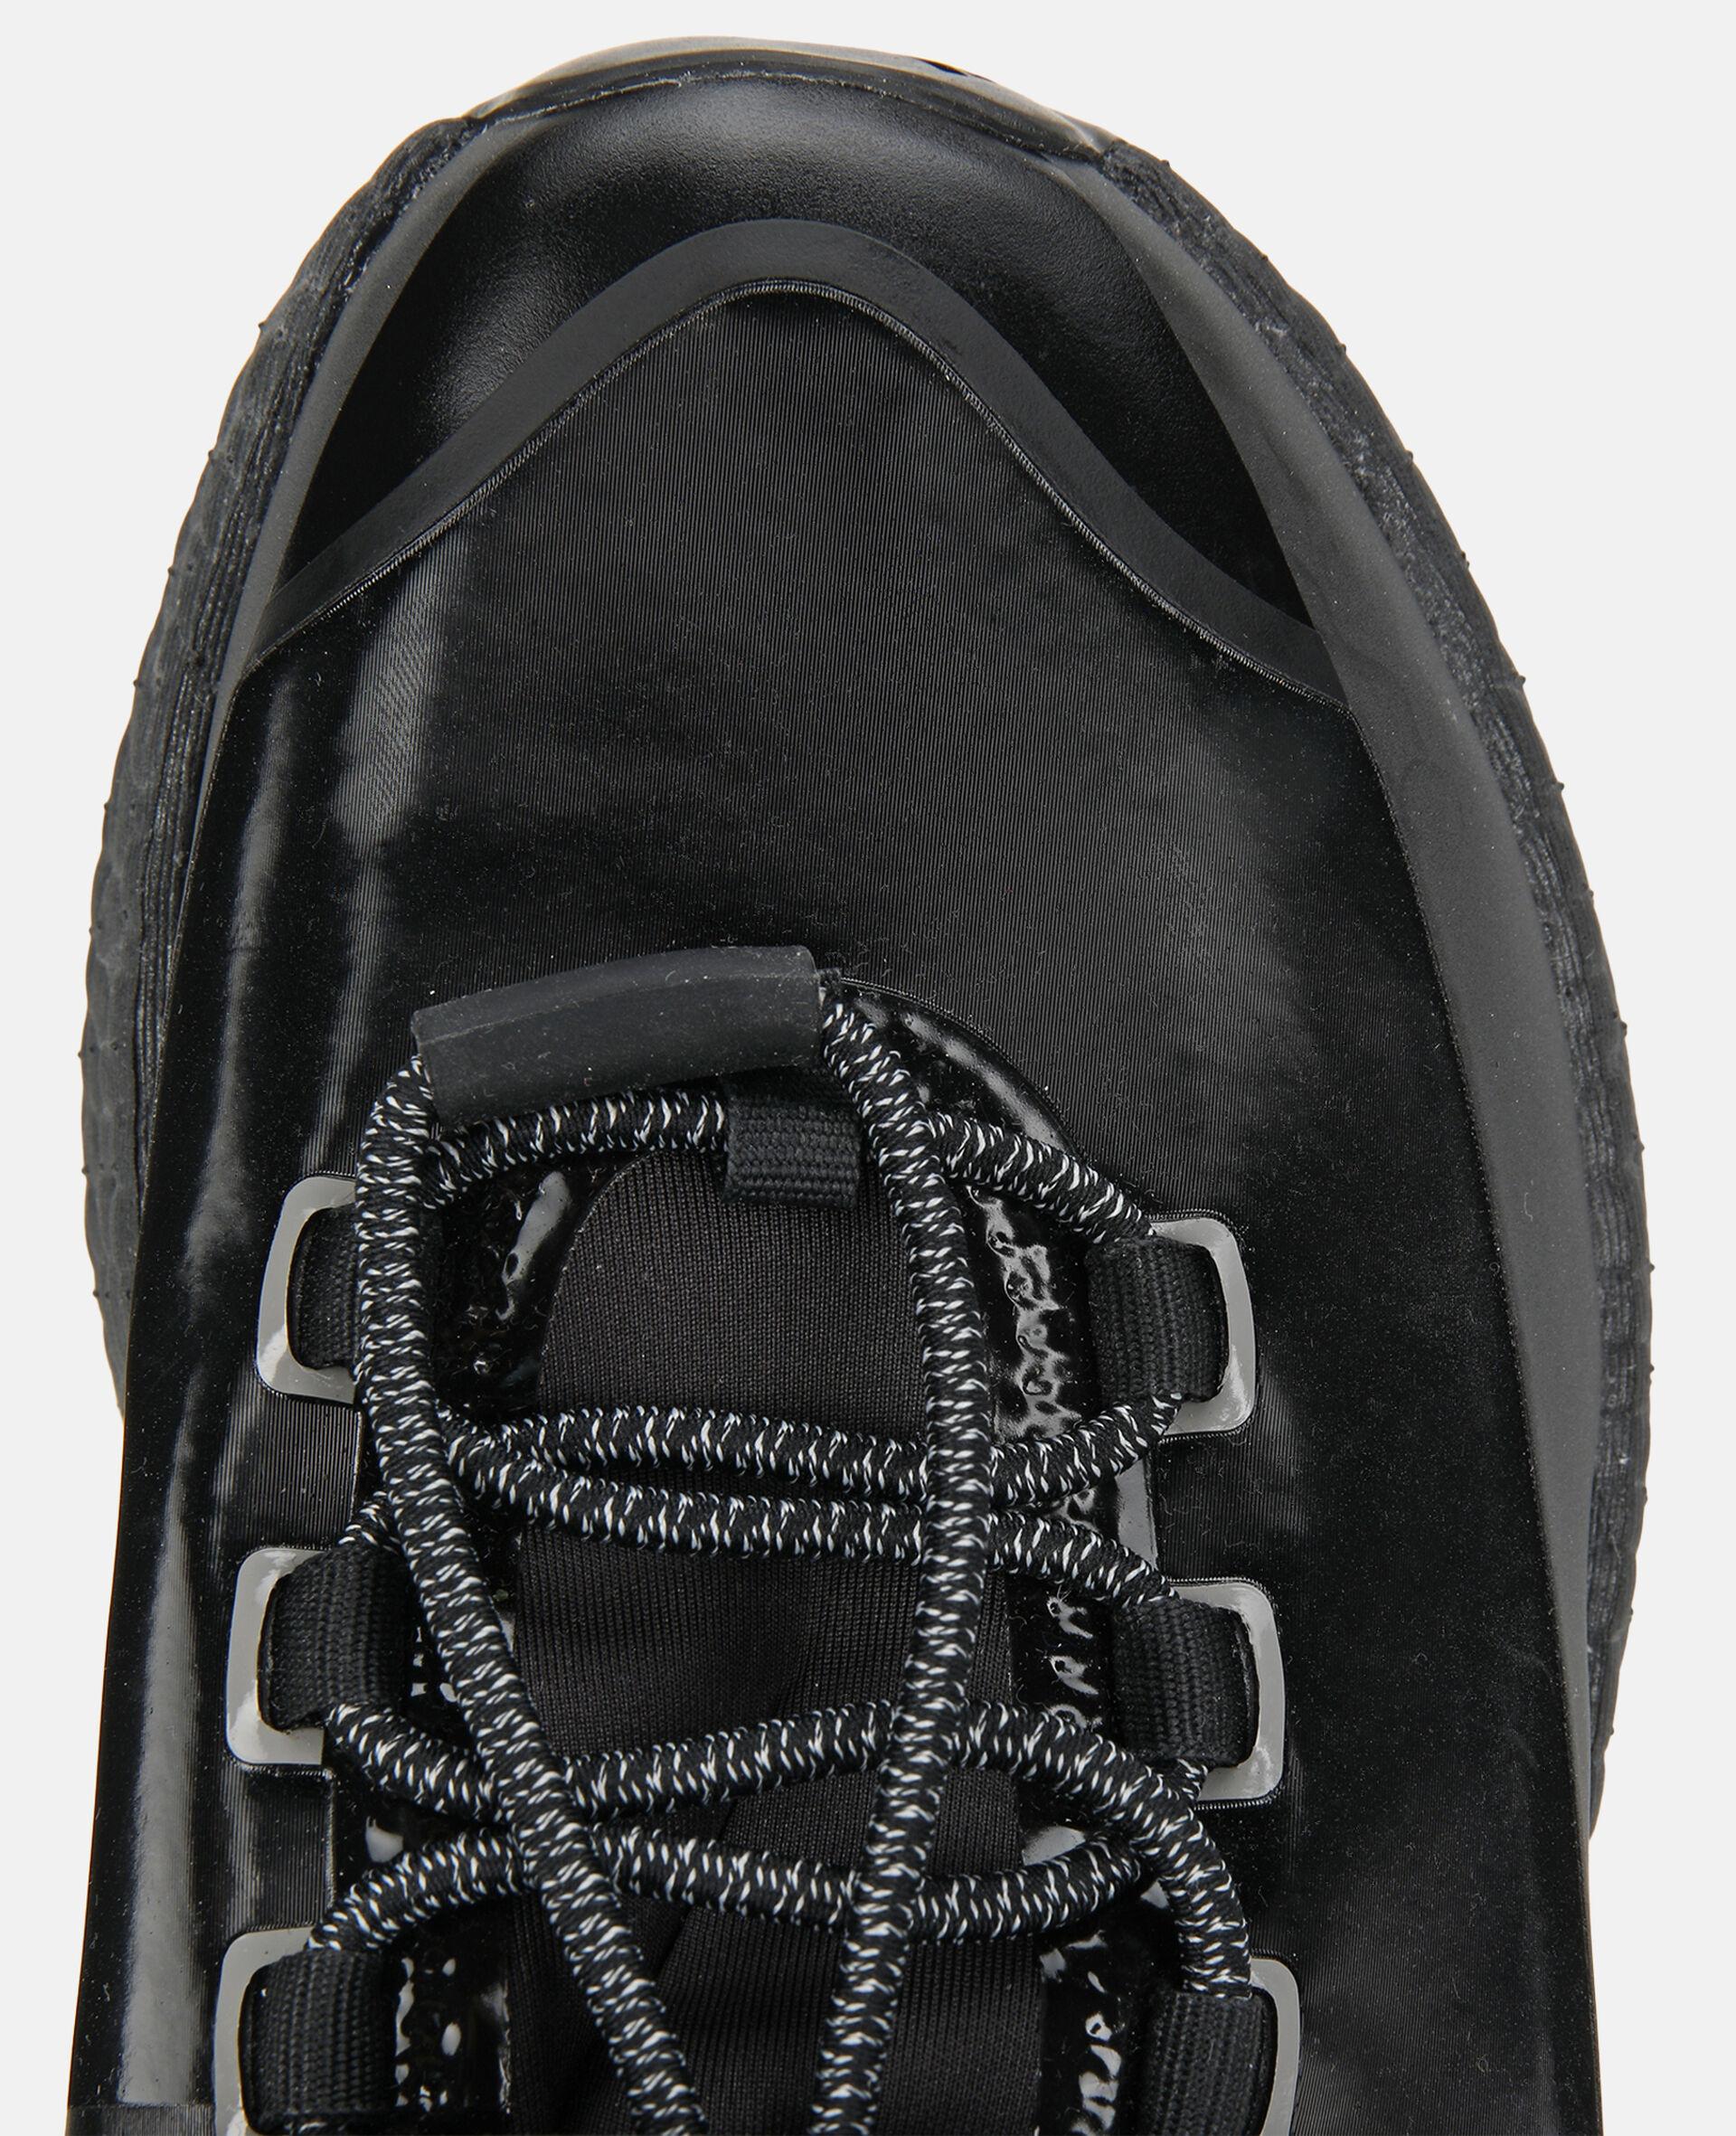 Chaussures de running Outdoor Boost rain.rdy noires -Noir-large image number 3